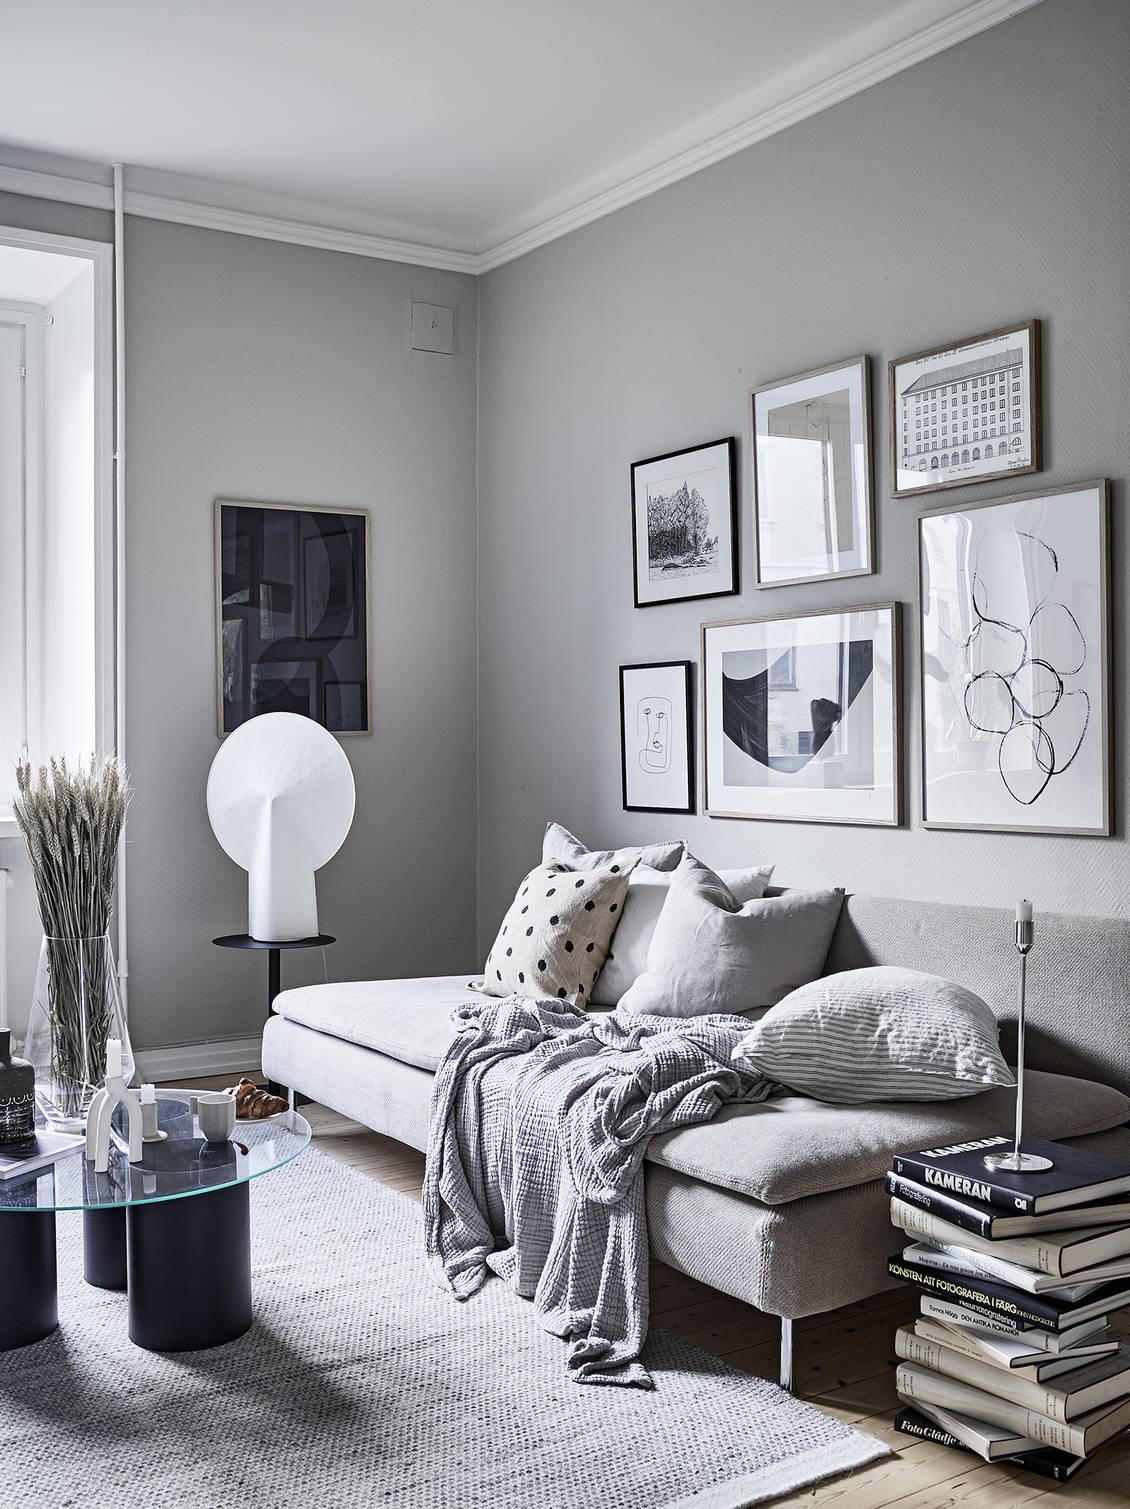 Cozy One Room Apartment Coco Lapine Designcoco Lapine Design